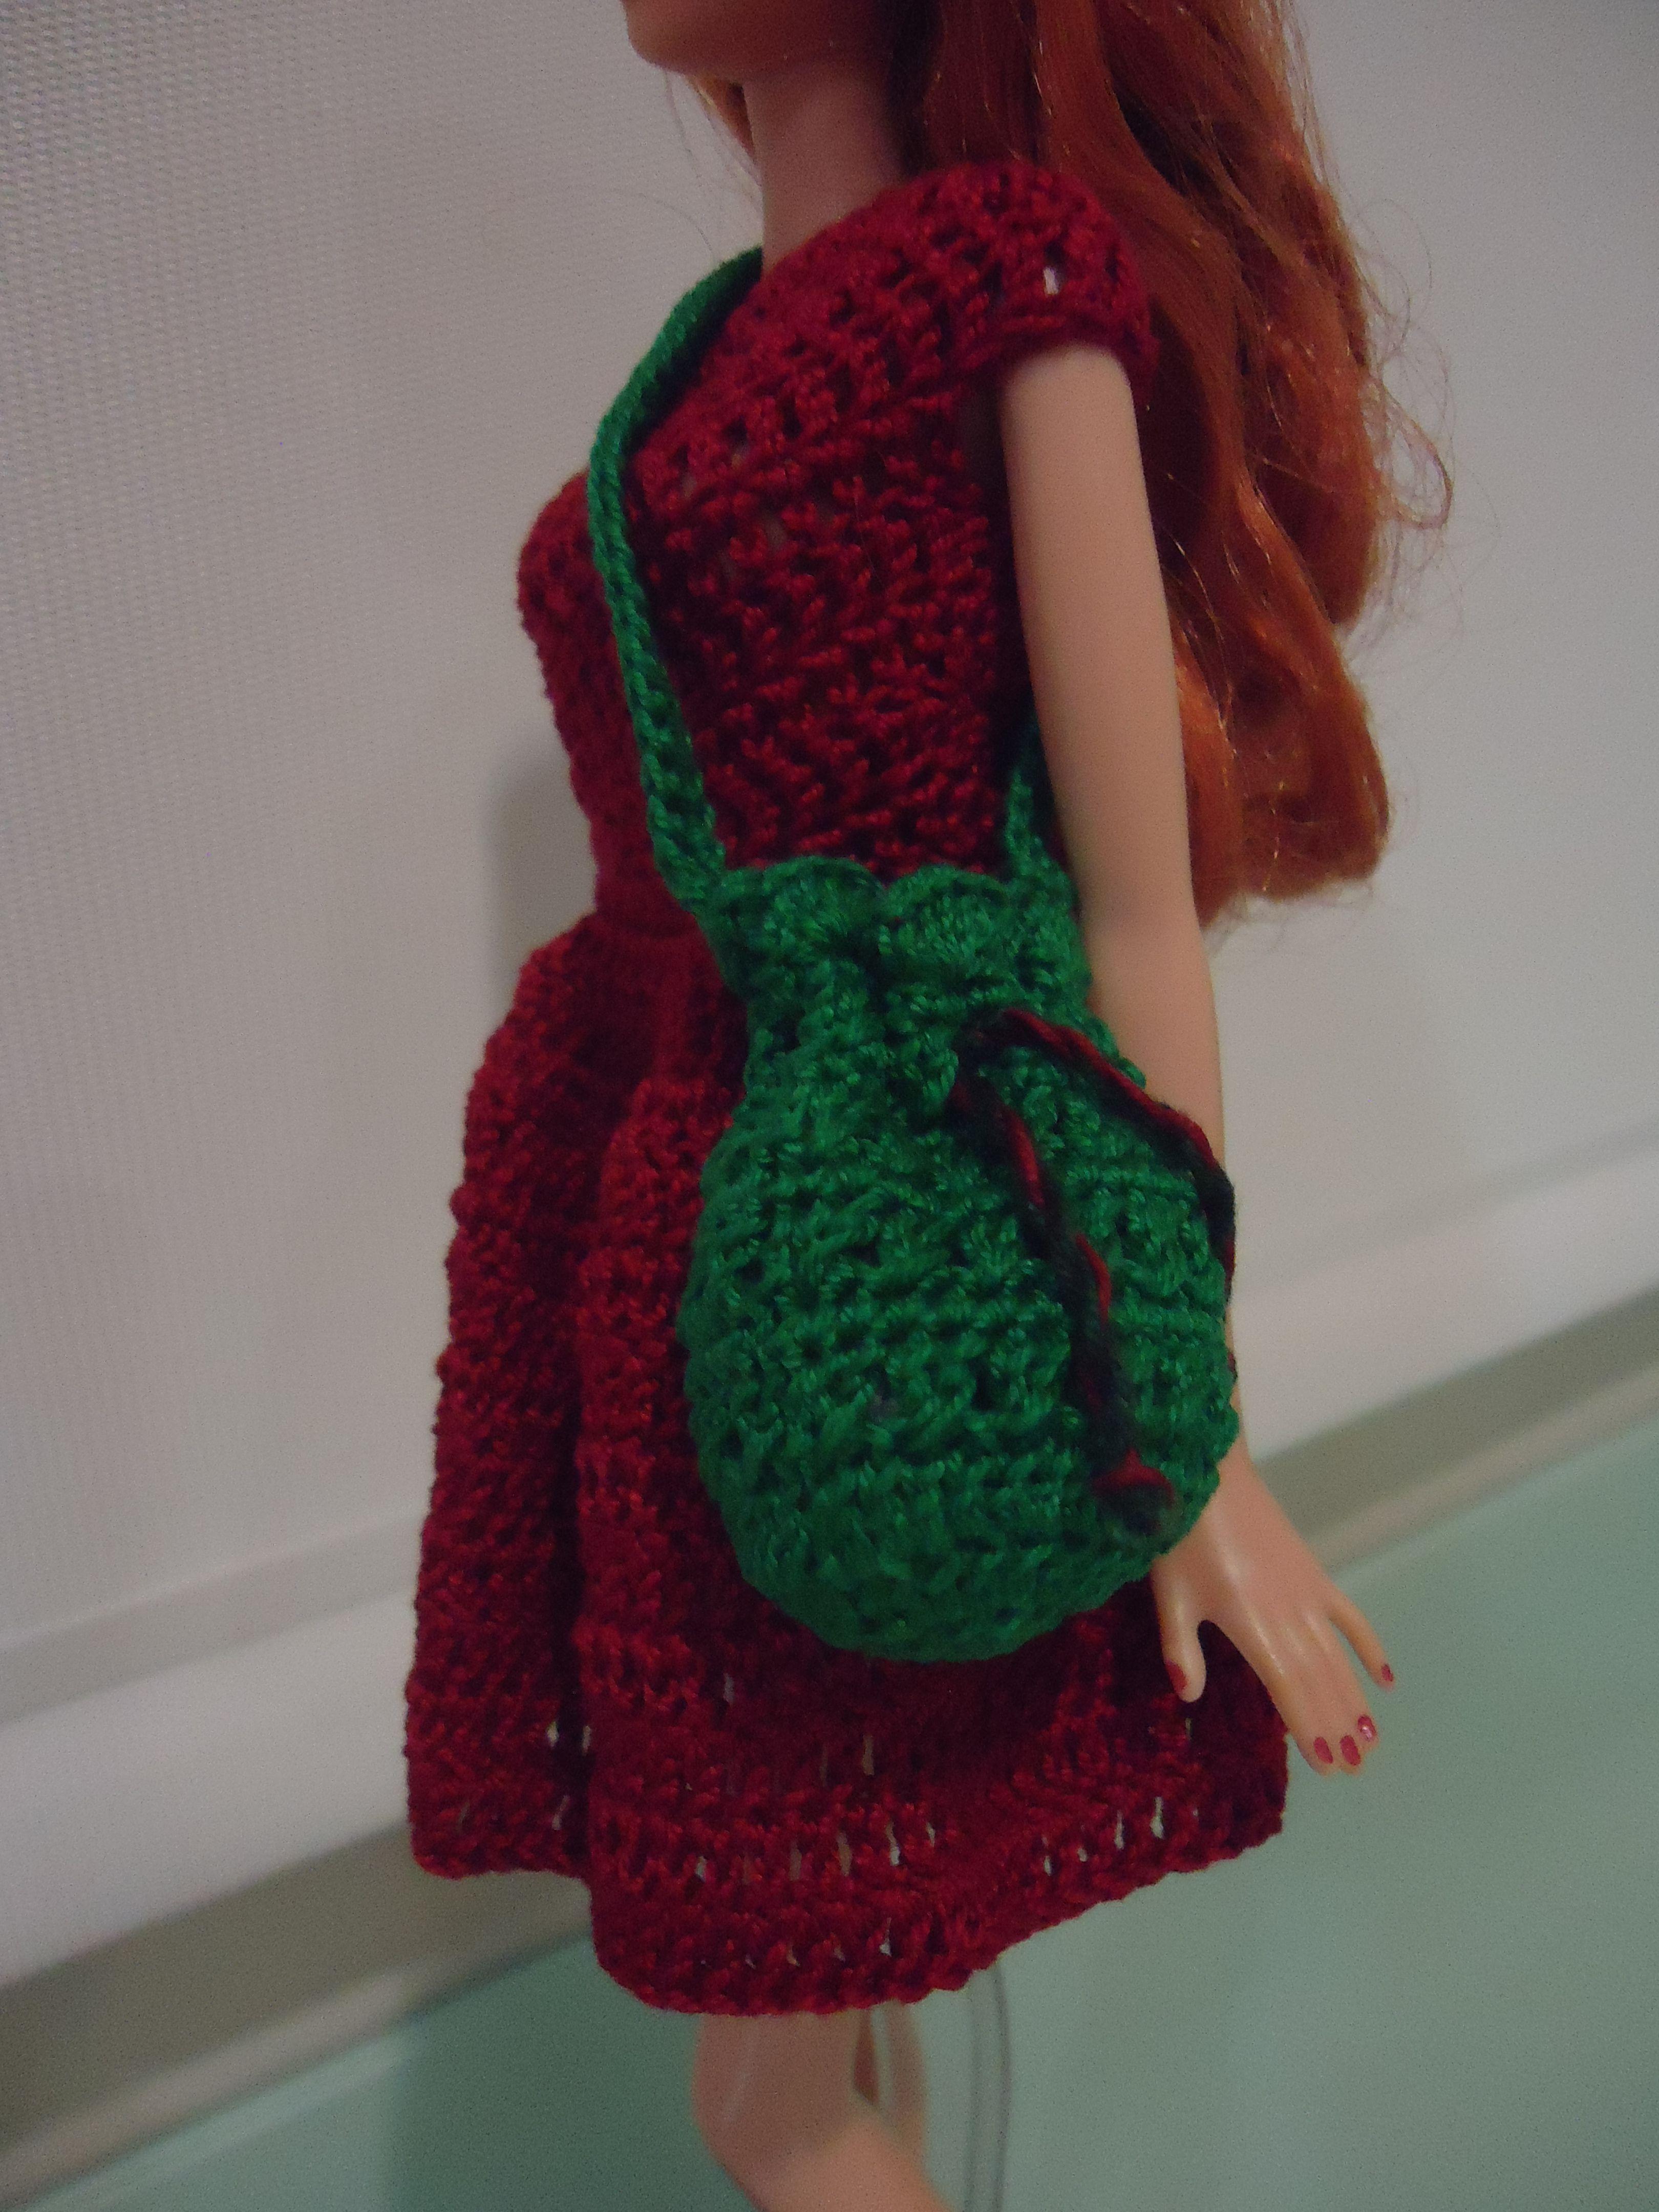 Barbie Bikini Drawstring Bag (Free Crochet Pattern) | Mädchenkram ...